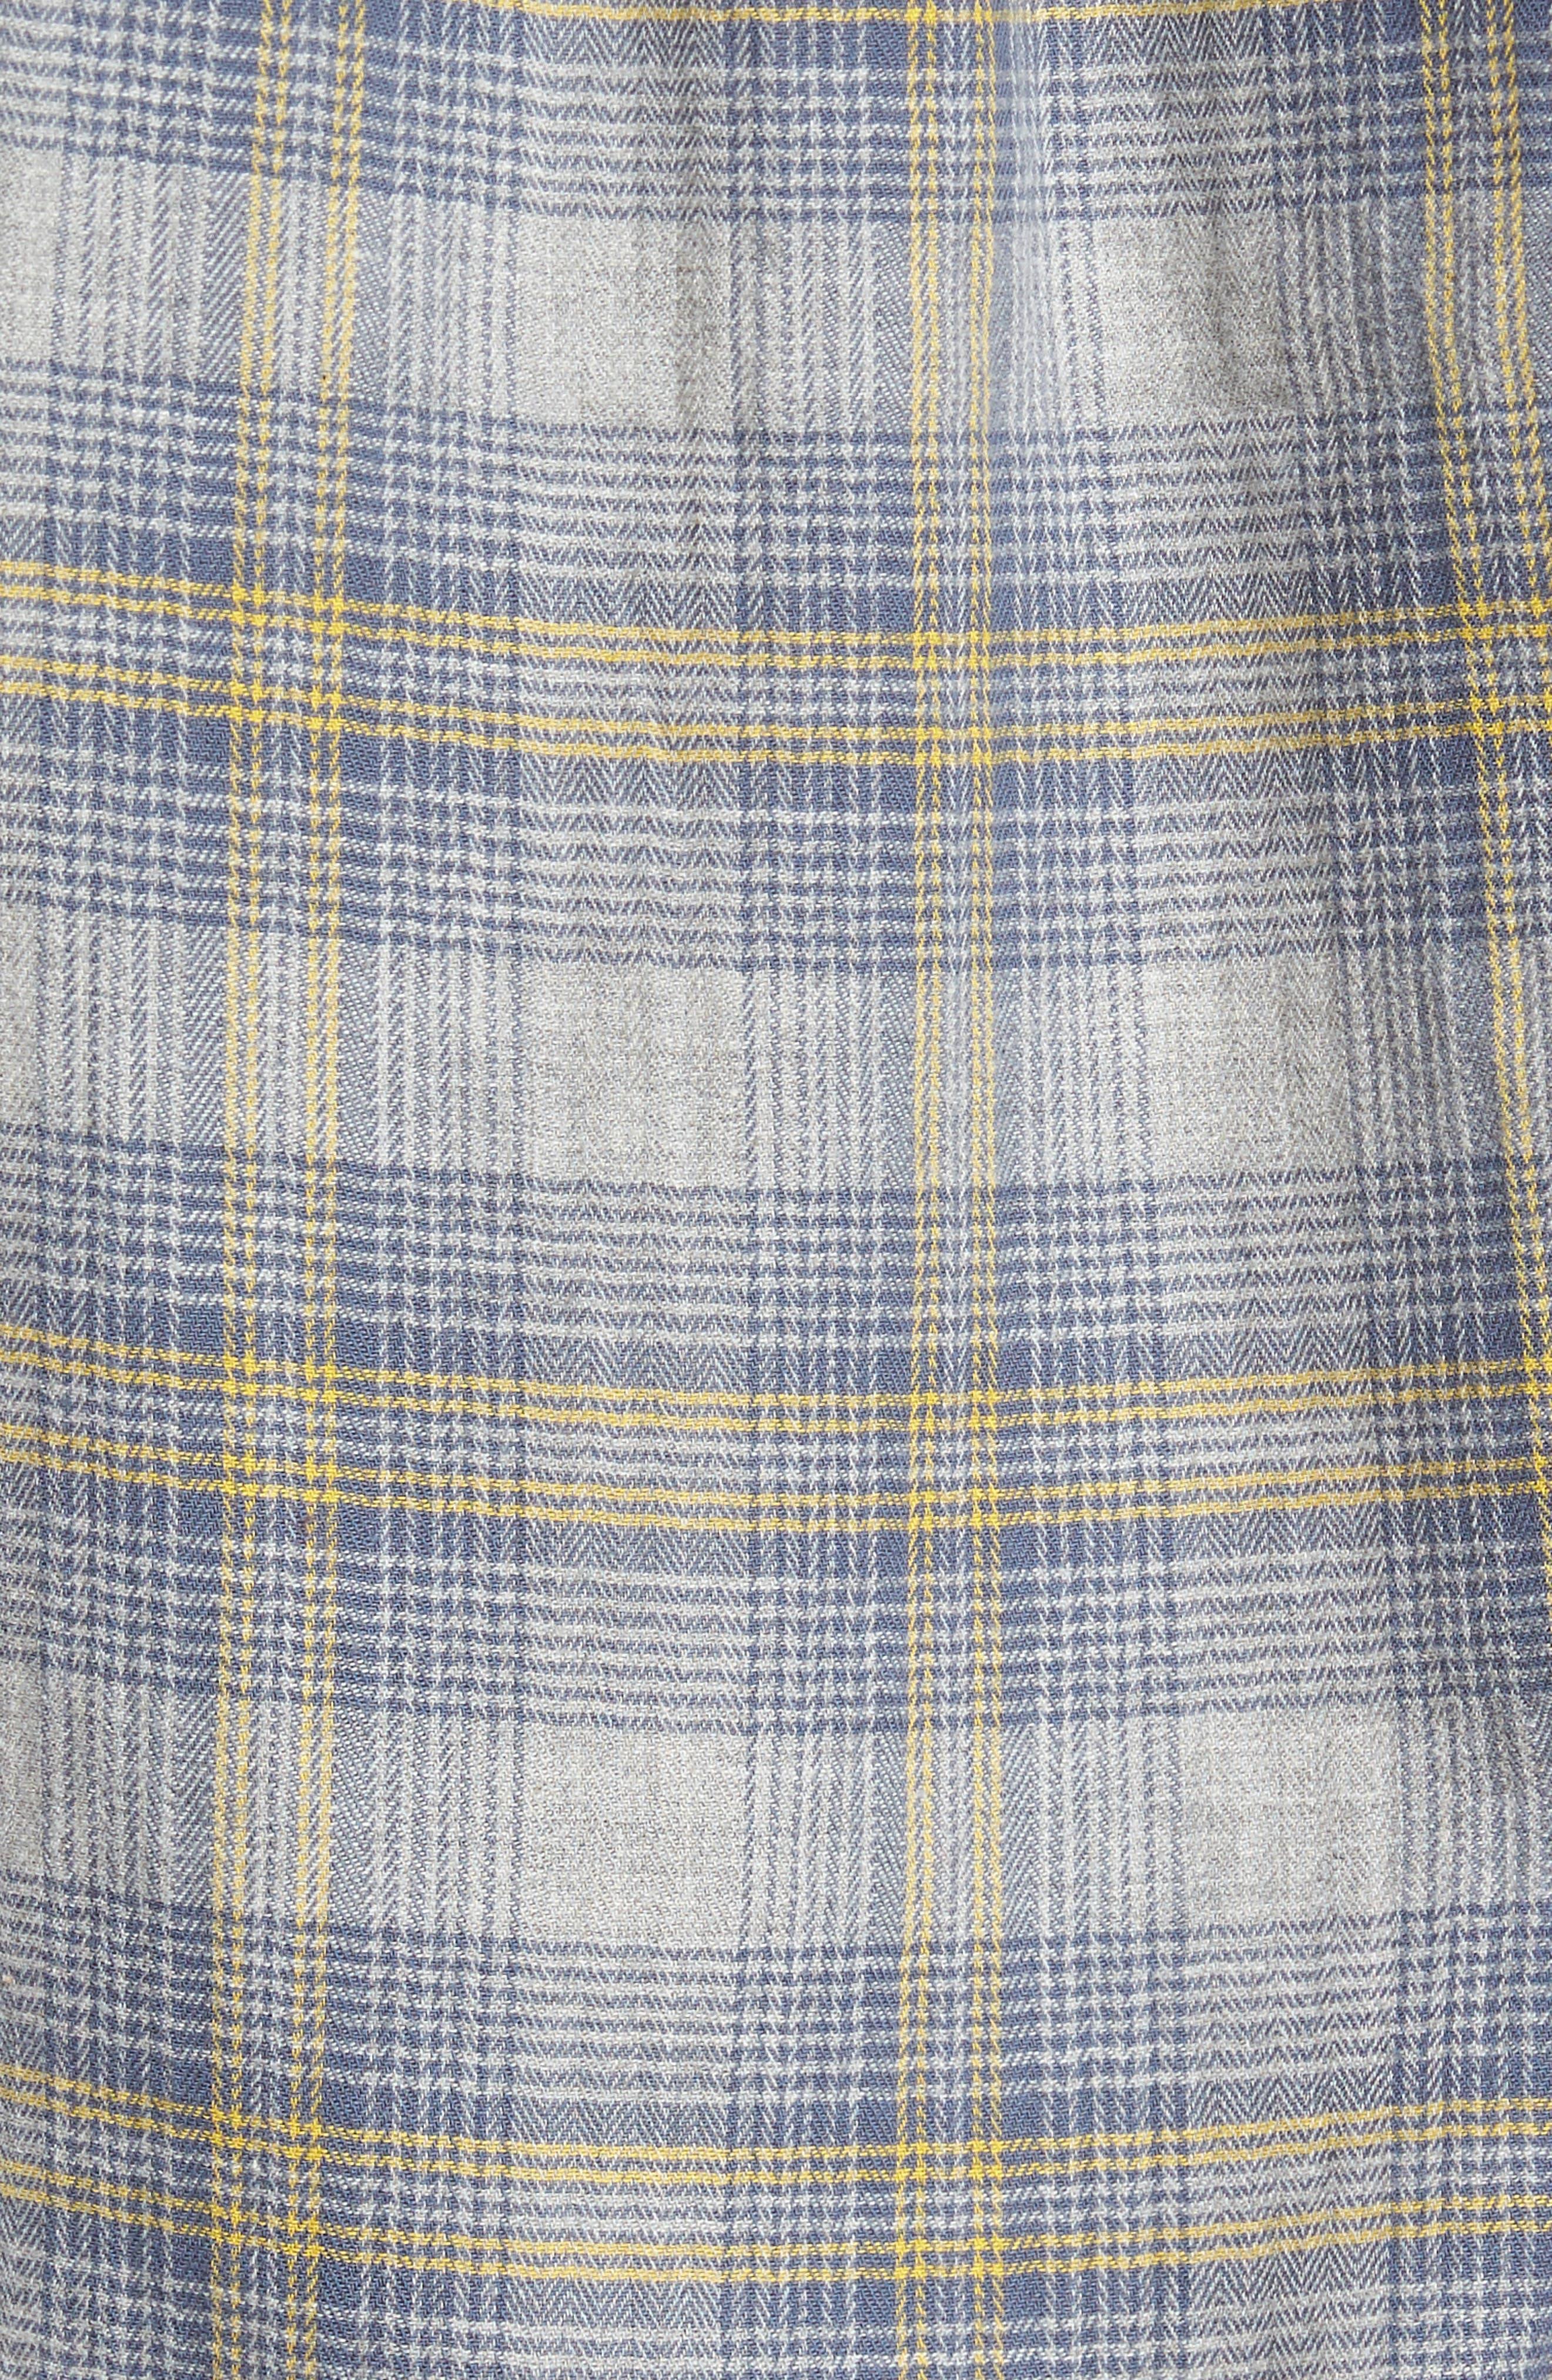 Laugna Herringbone Twill Shirt,                             Alternate thumbnail 5, color,                             032